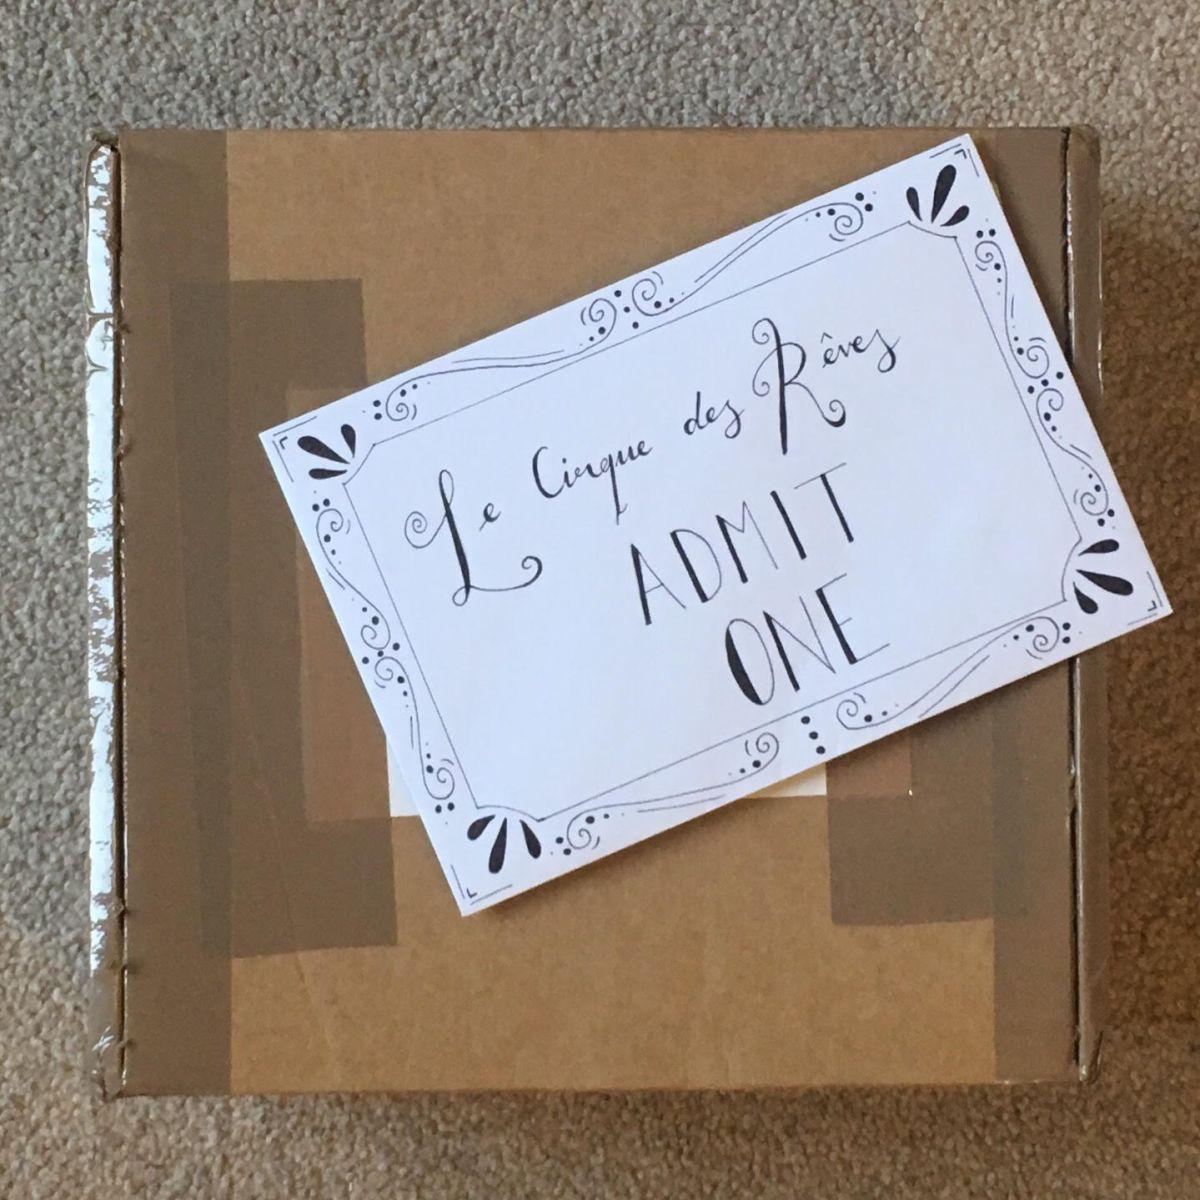 Book Box Unboxing: The Mystery Book Box (gunpowder, treason &plot)